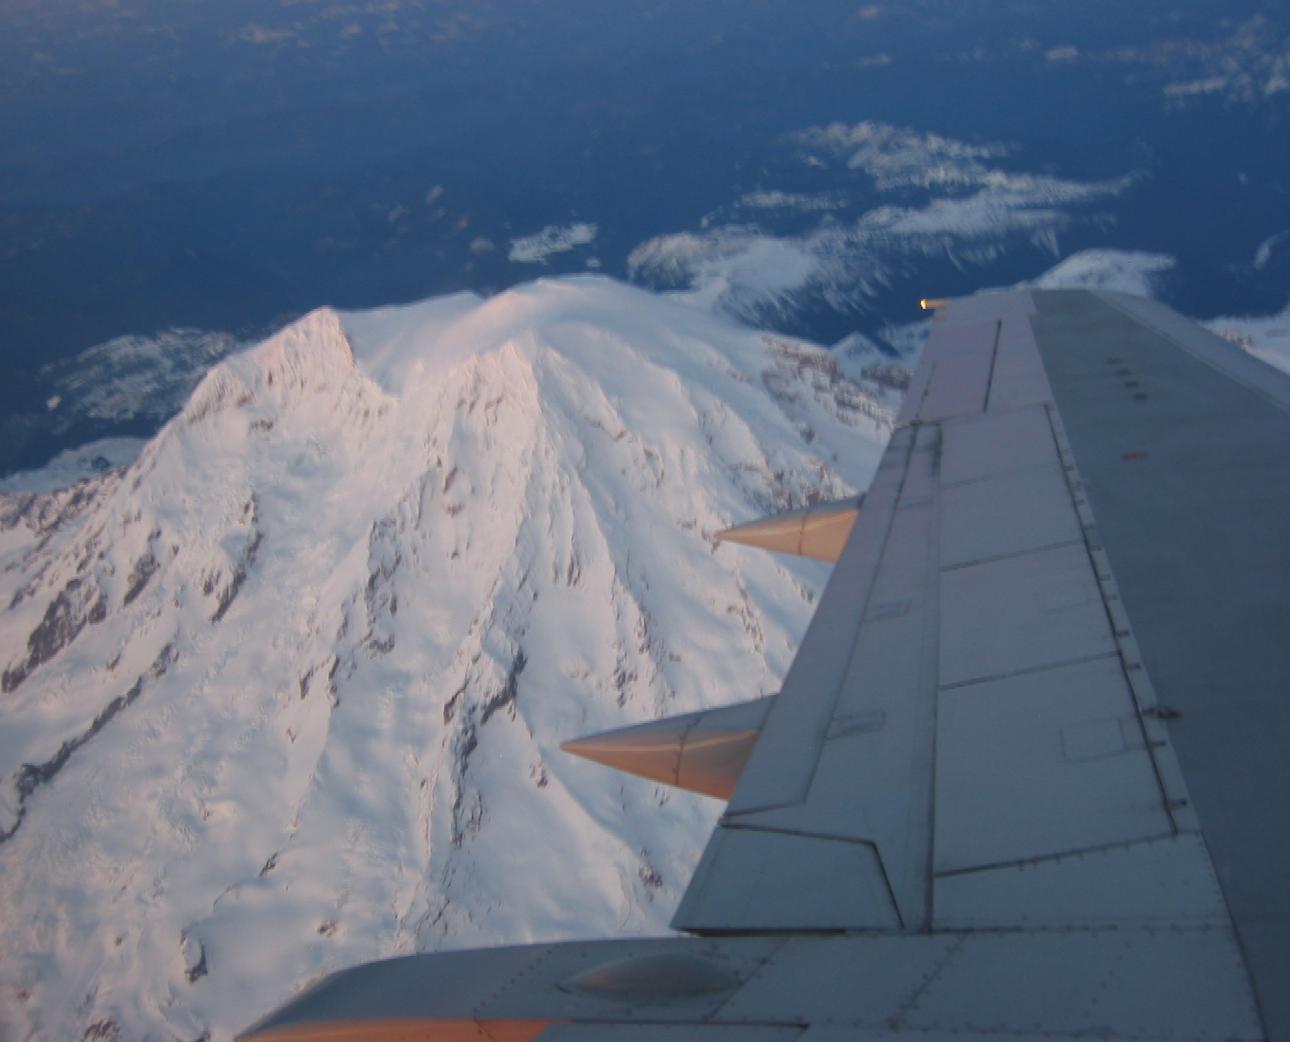 Mt. Rainier Plane shot